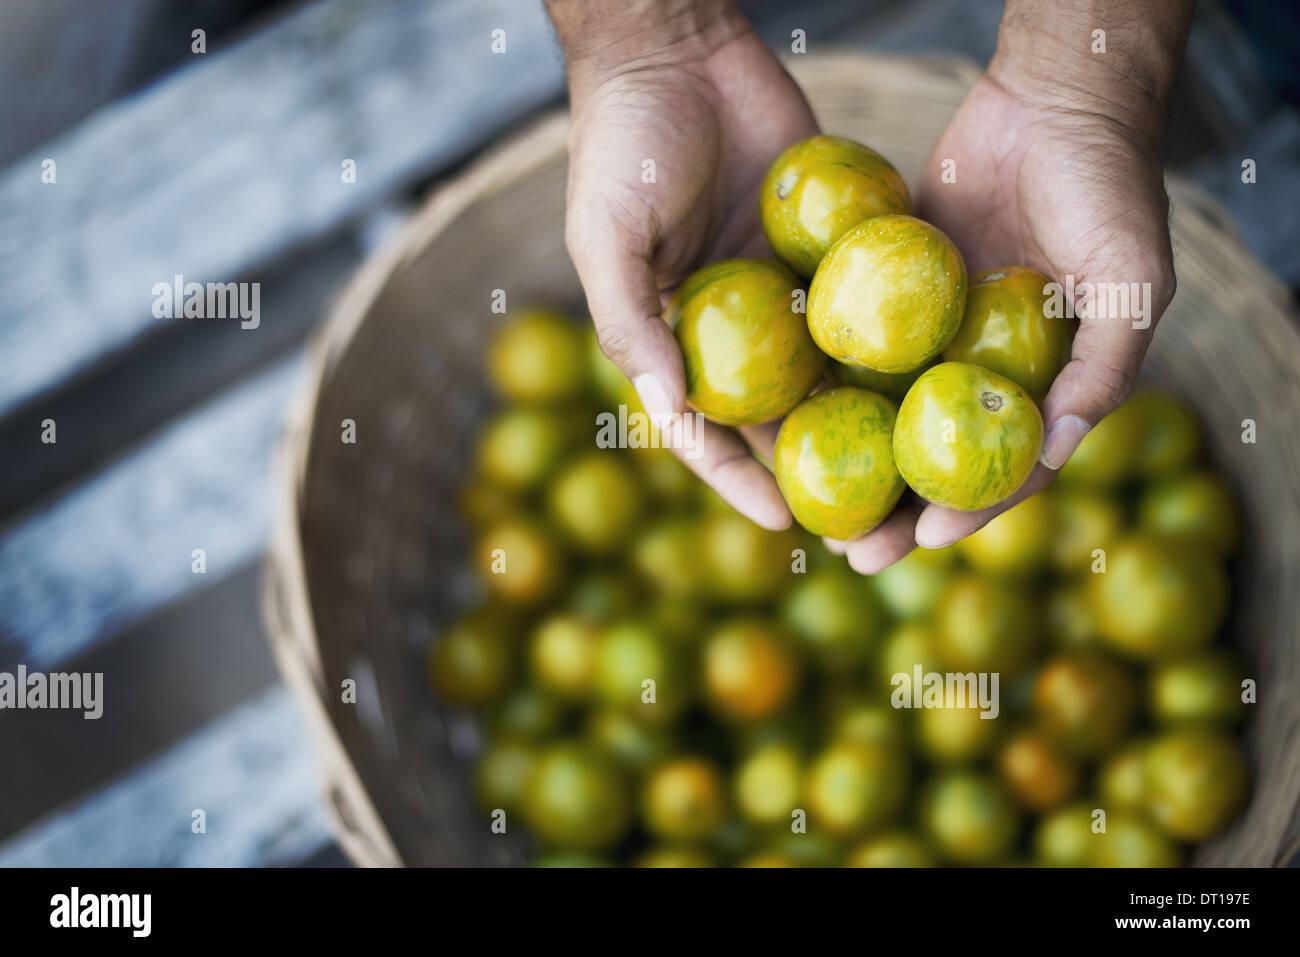 Woodstock New York USA Organic Tomatillo just harvested - Stock Image